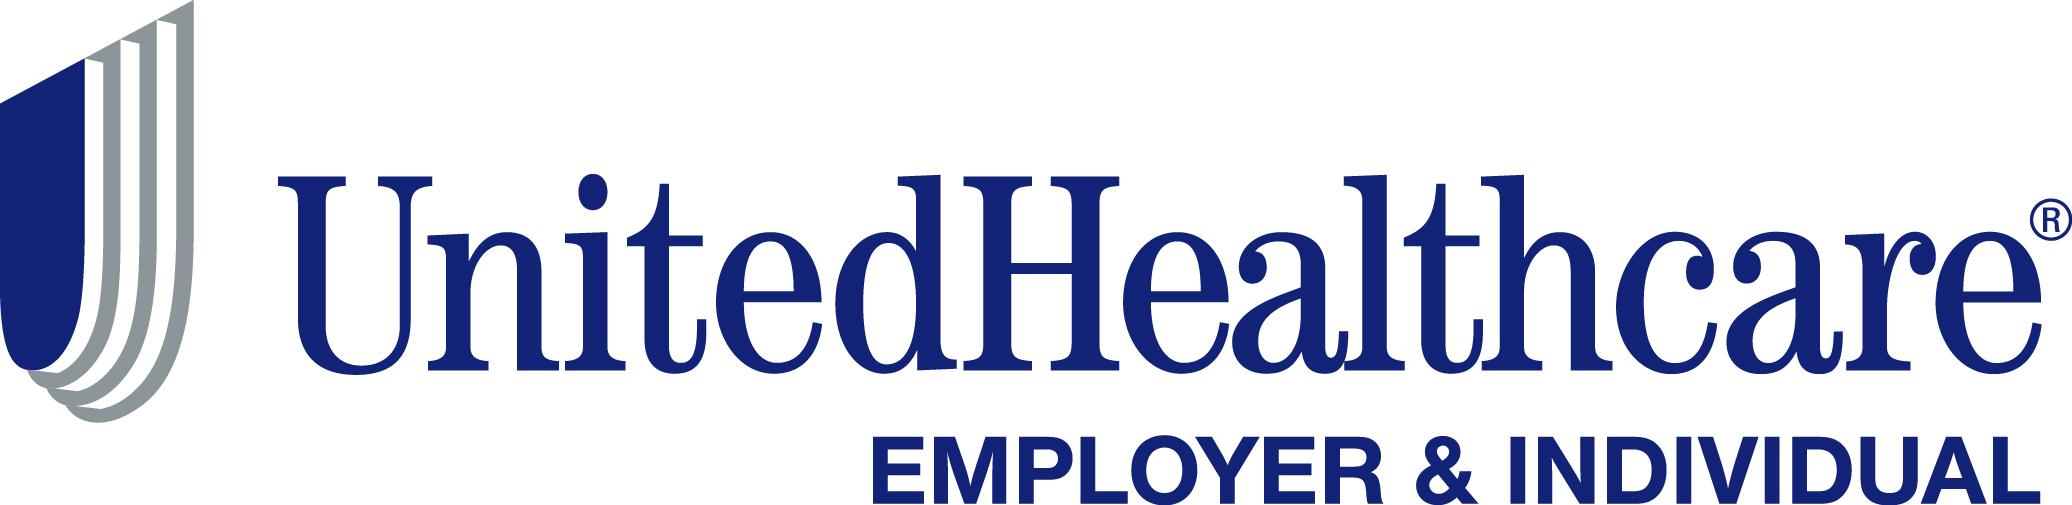 UnitedHealthcare Employer & Individual